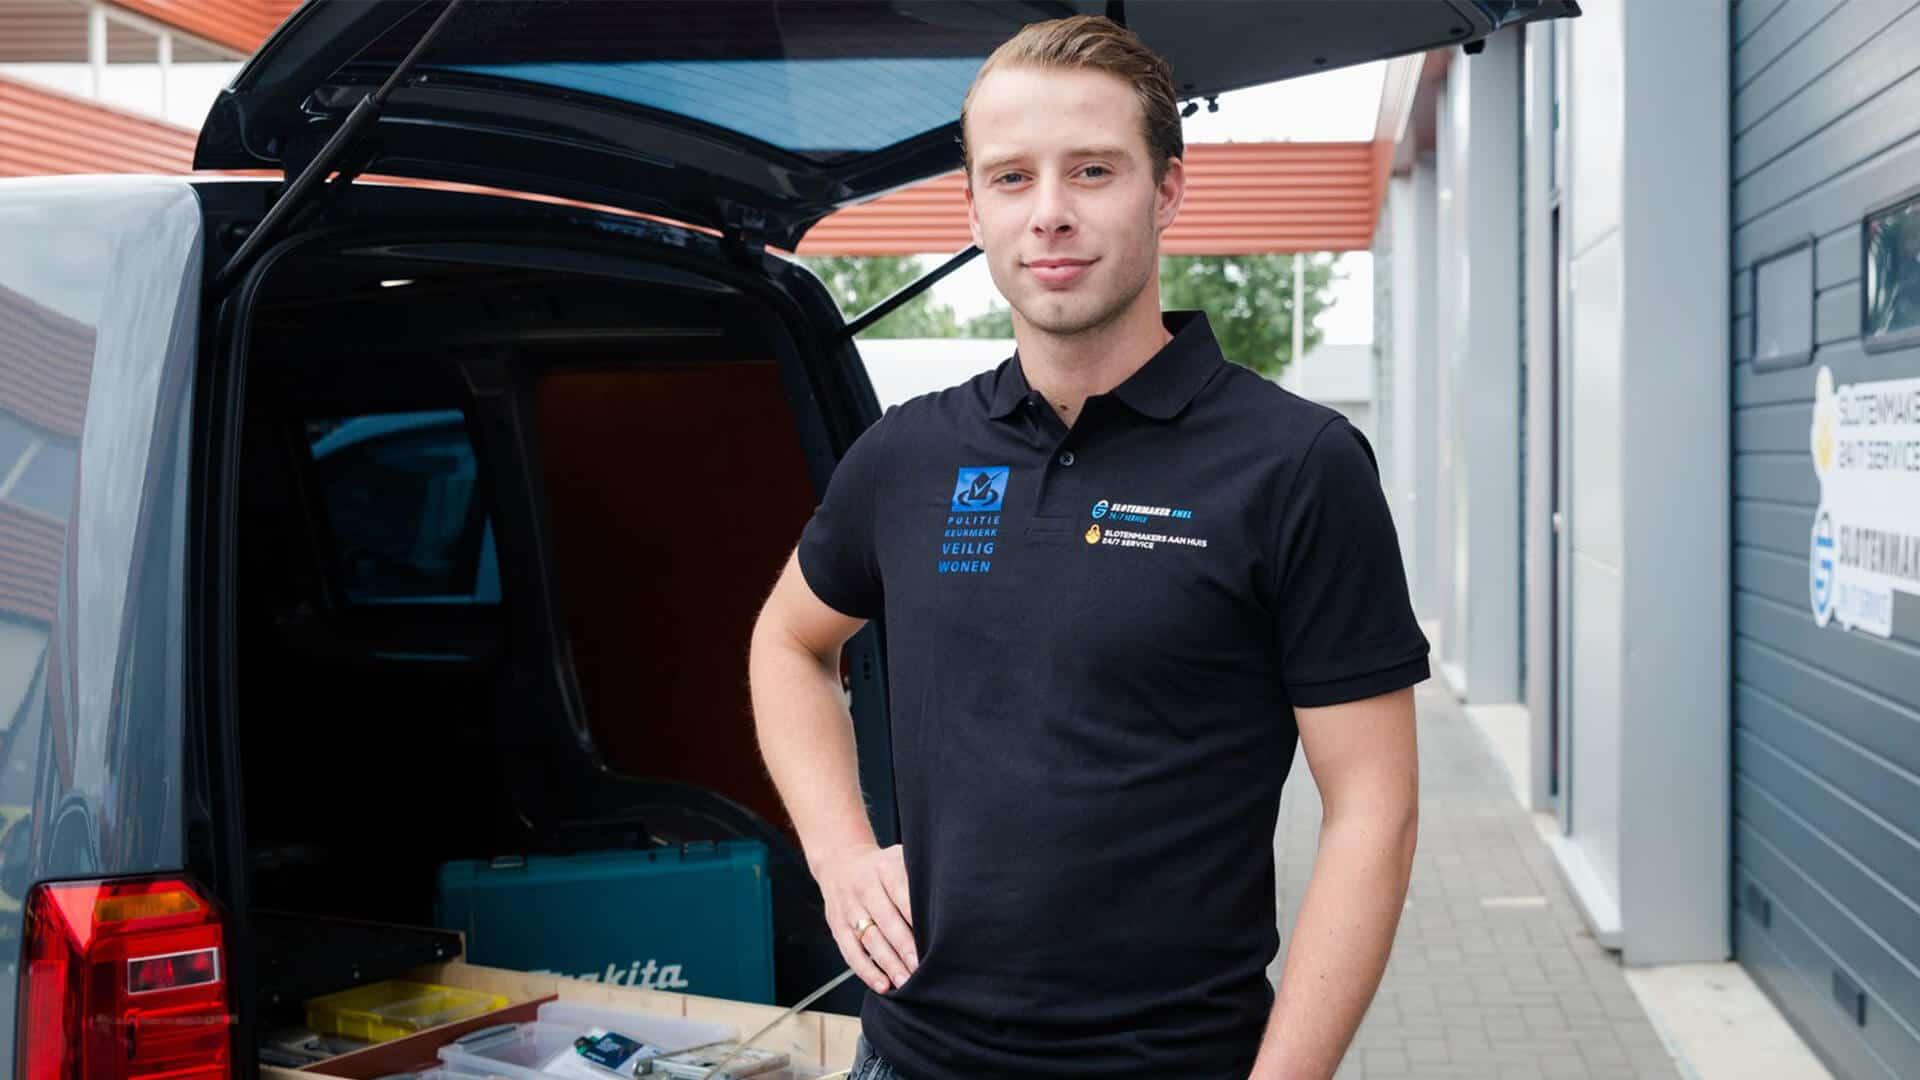 Slotenmaker Hoogezand